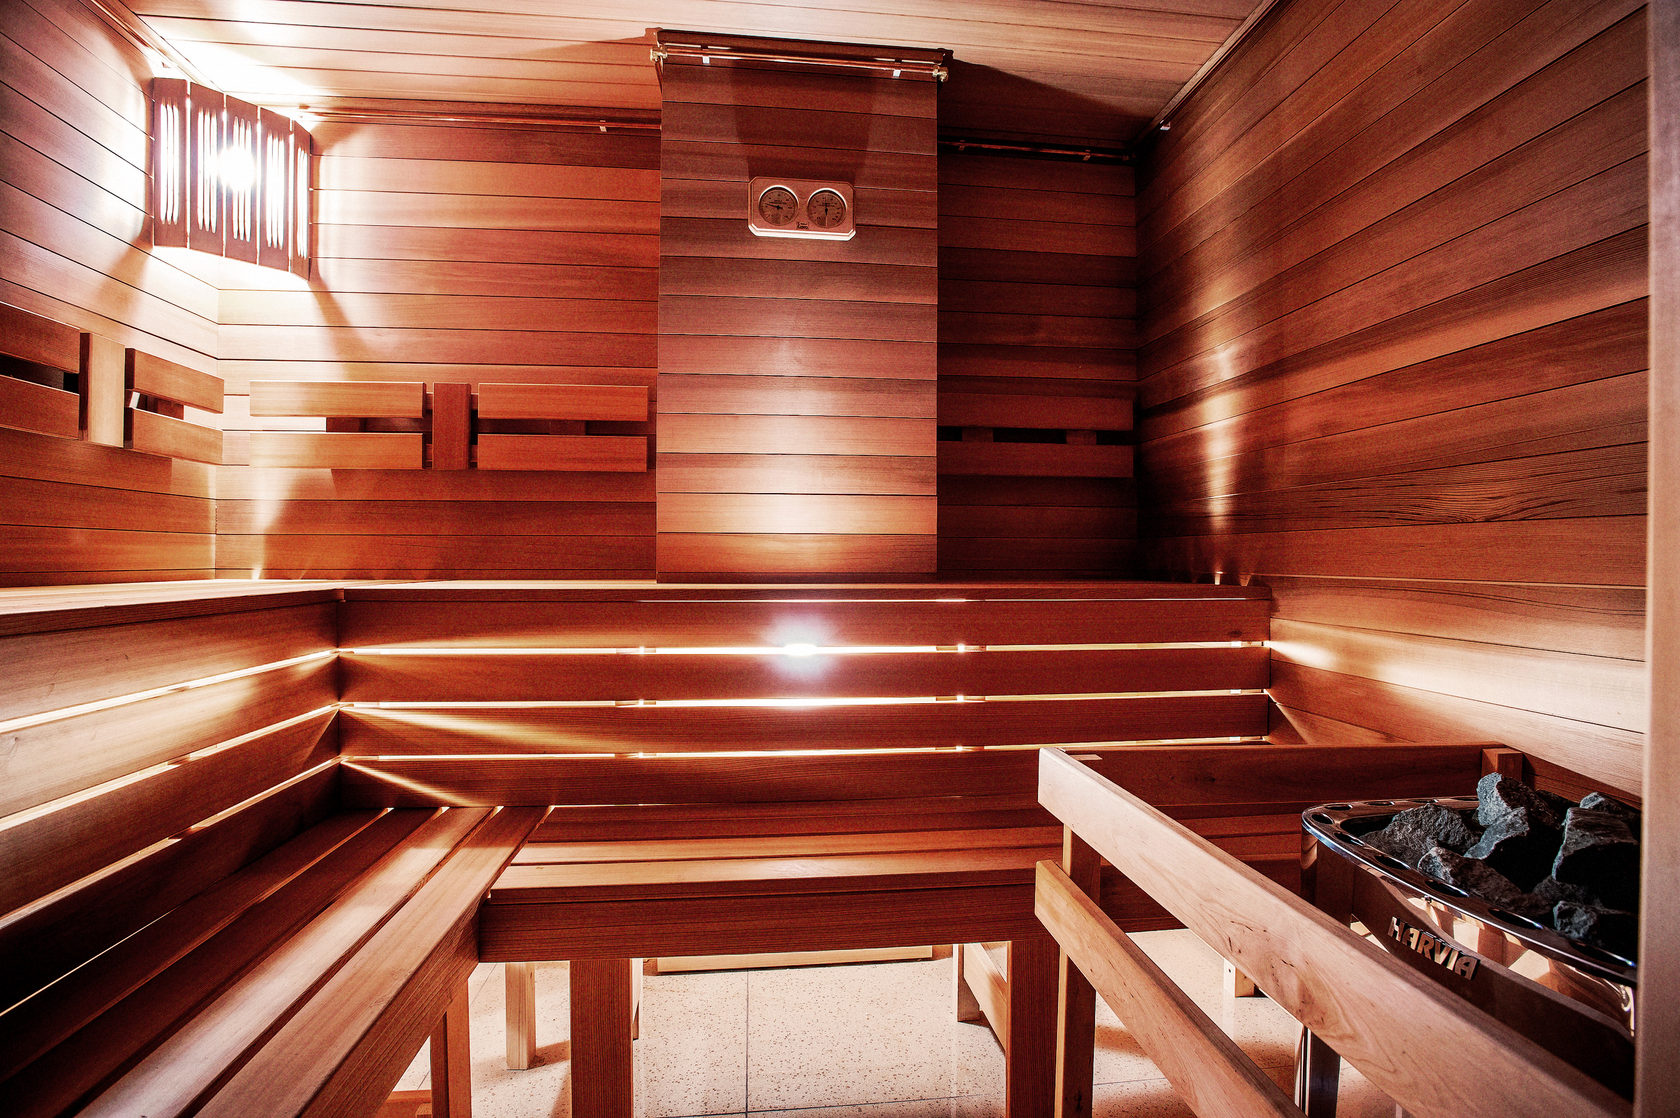 Отделка бани внутри: подбор материала, варианты оформления, фото